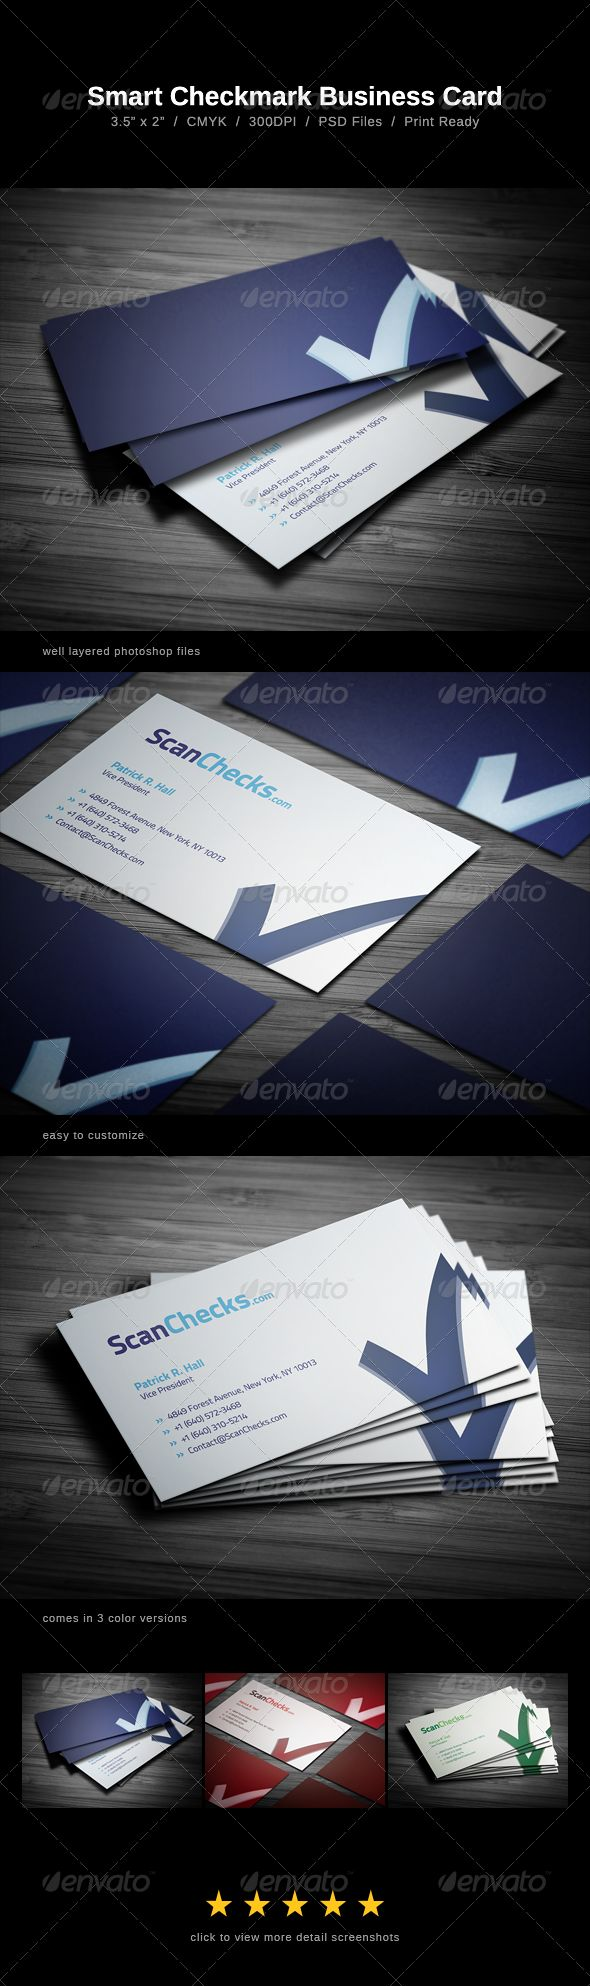 68 best business card design images on pinterest business cards smart checkmark business card alramifo Images